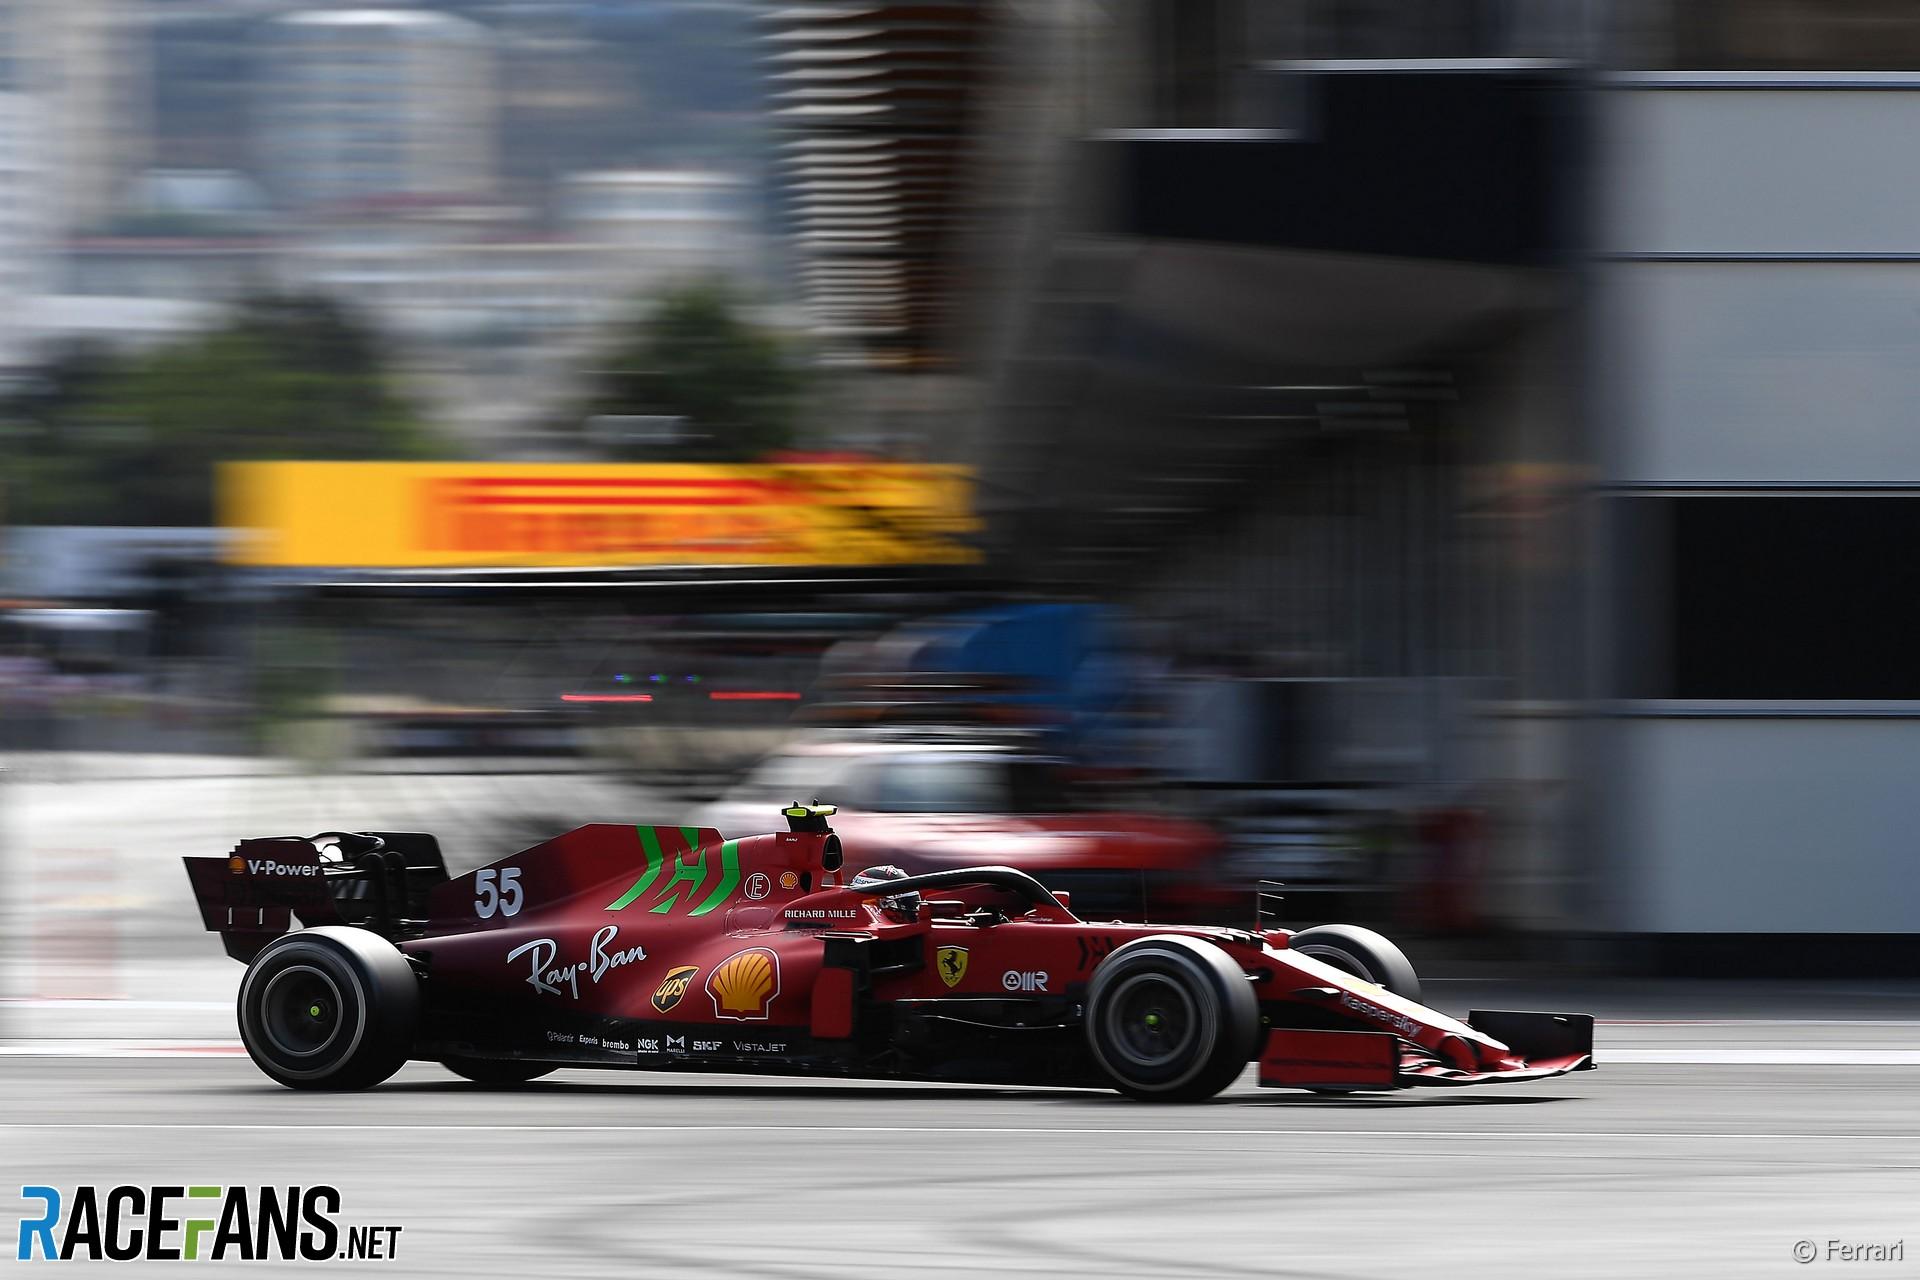 Carlos Sainz, Ferrari, Baku Street Circuit, 2021